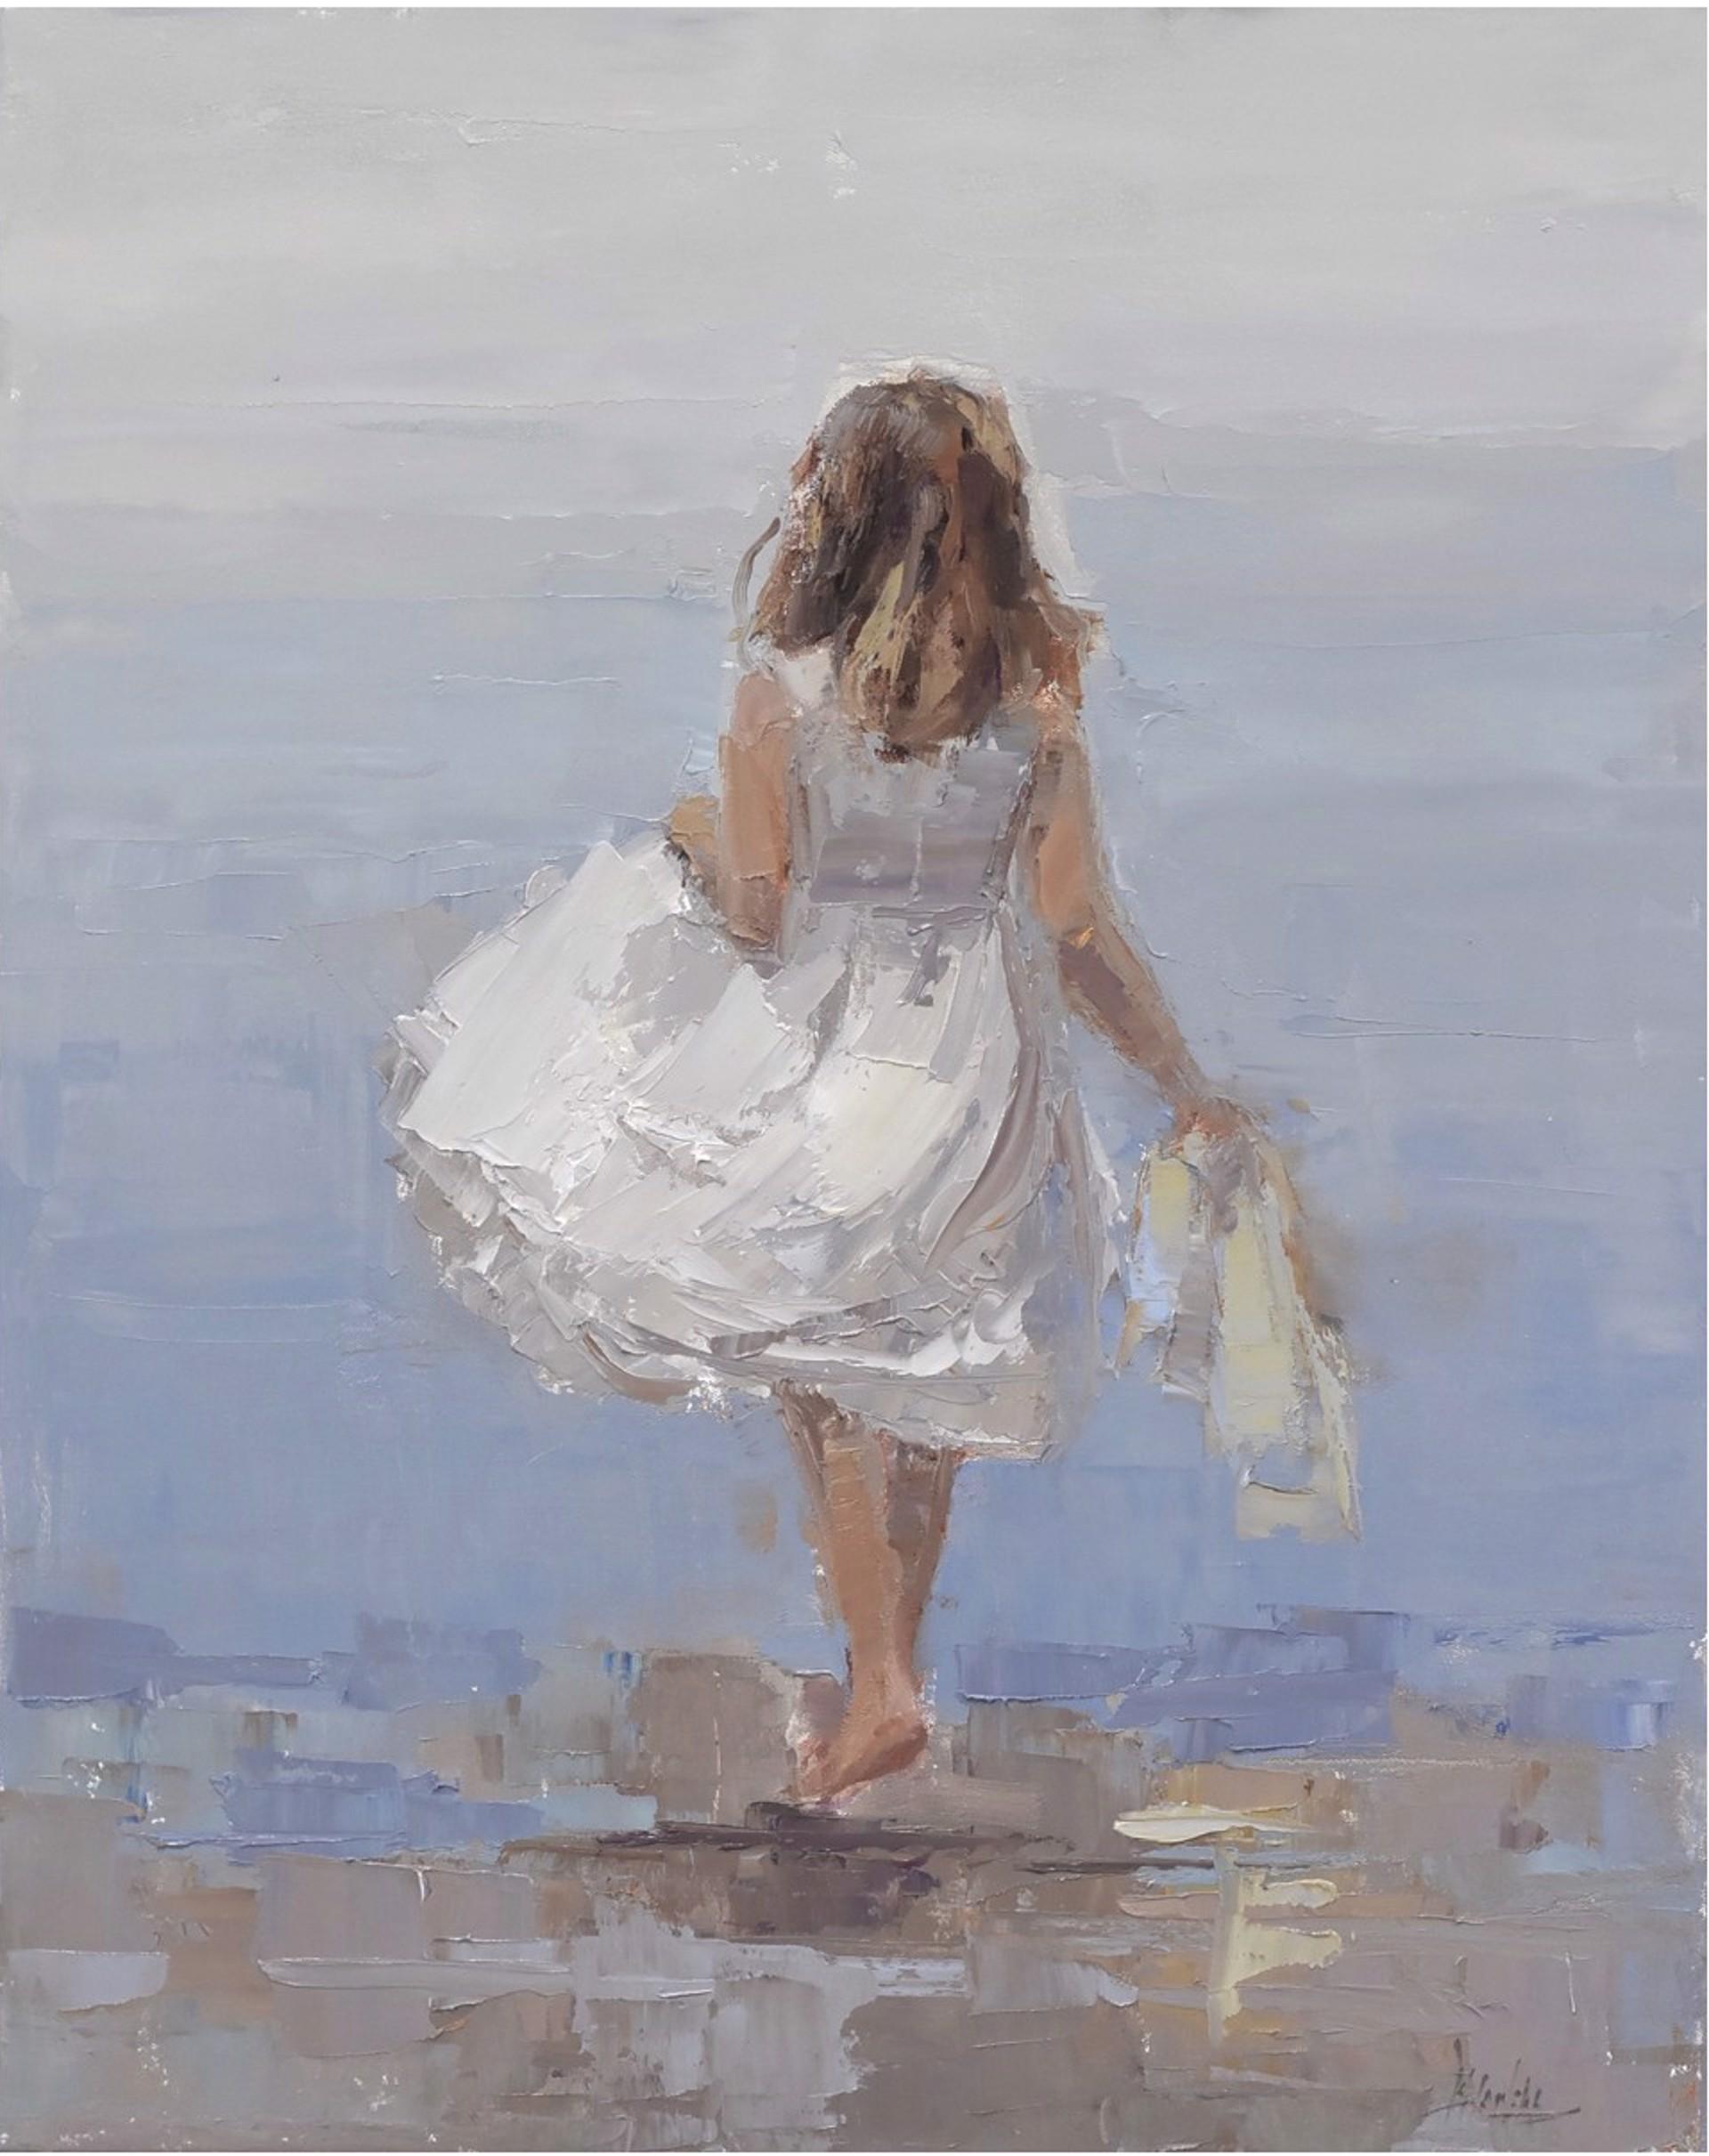 Follow Me by Barbara Flowers